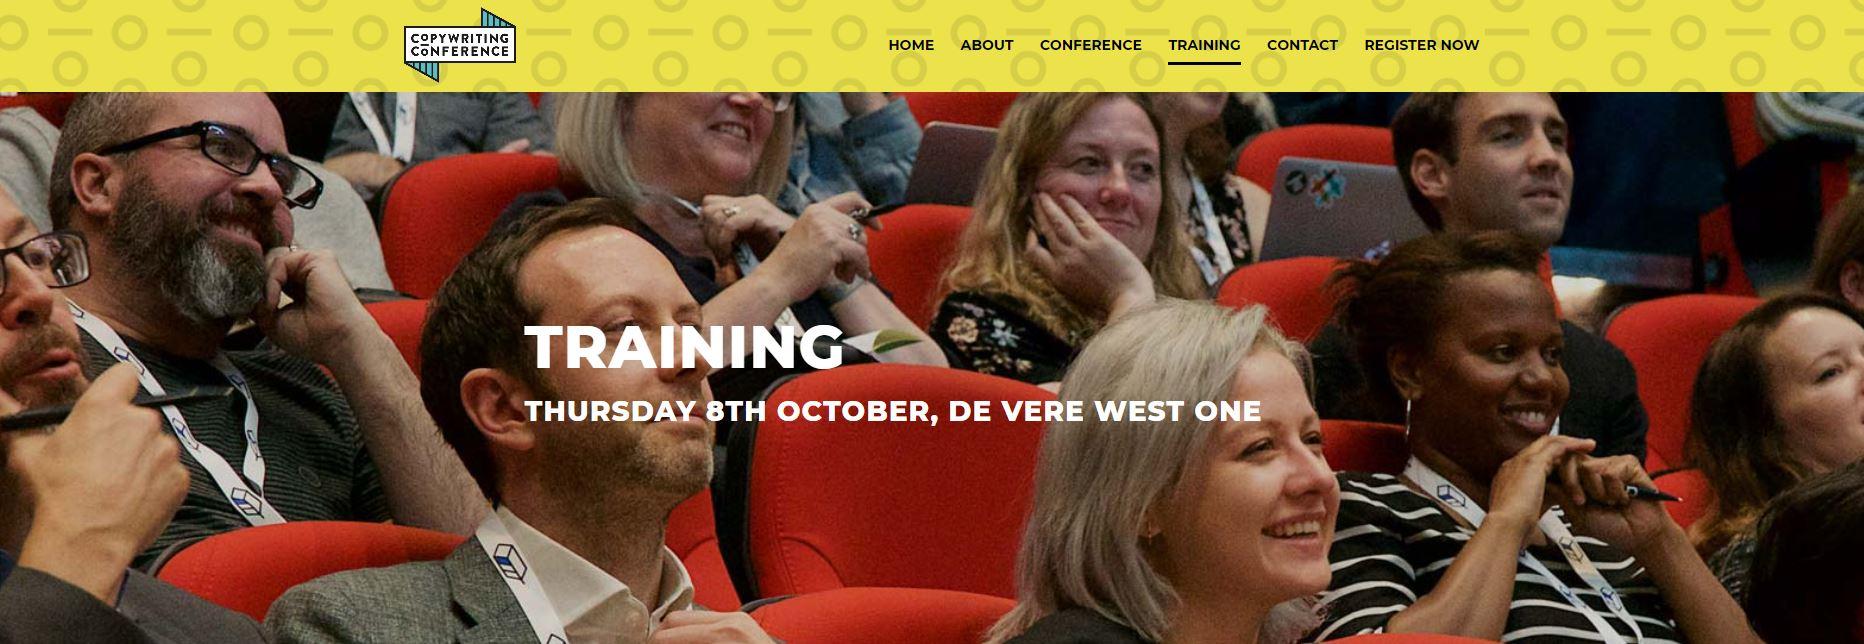 Copywriting Conference registration